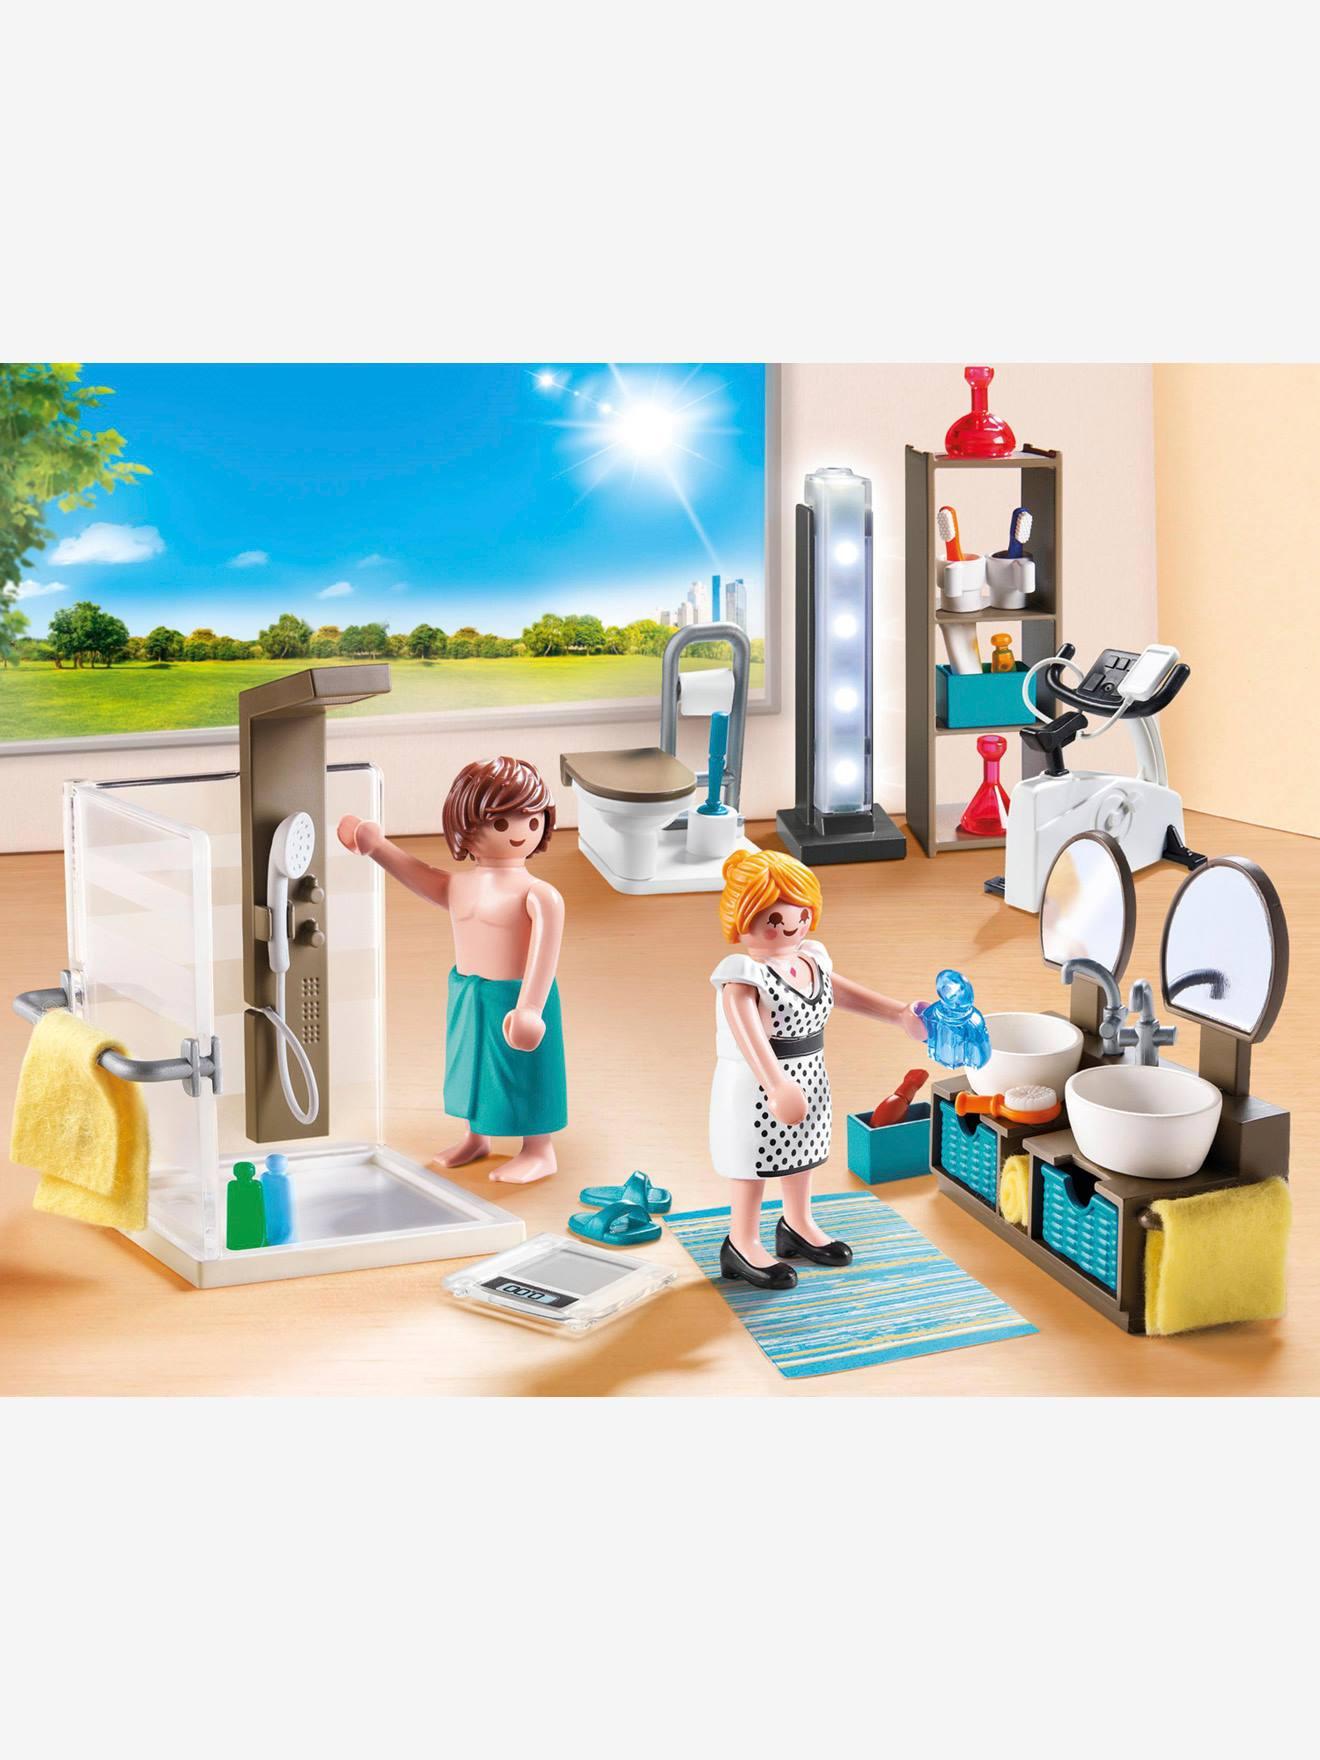 Kinderzimmer Junge Playmobil | Feuerwehrstation Selber Basteln ...